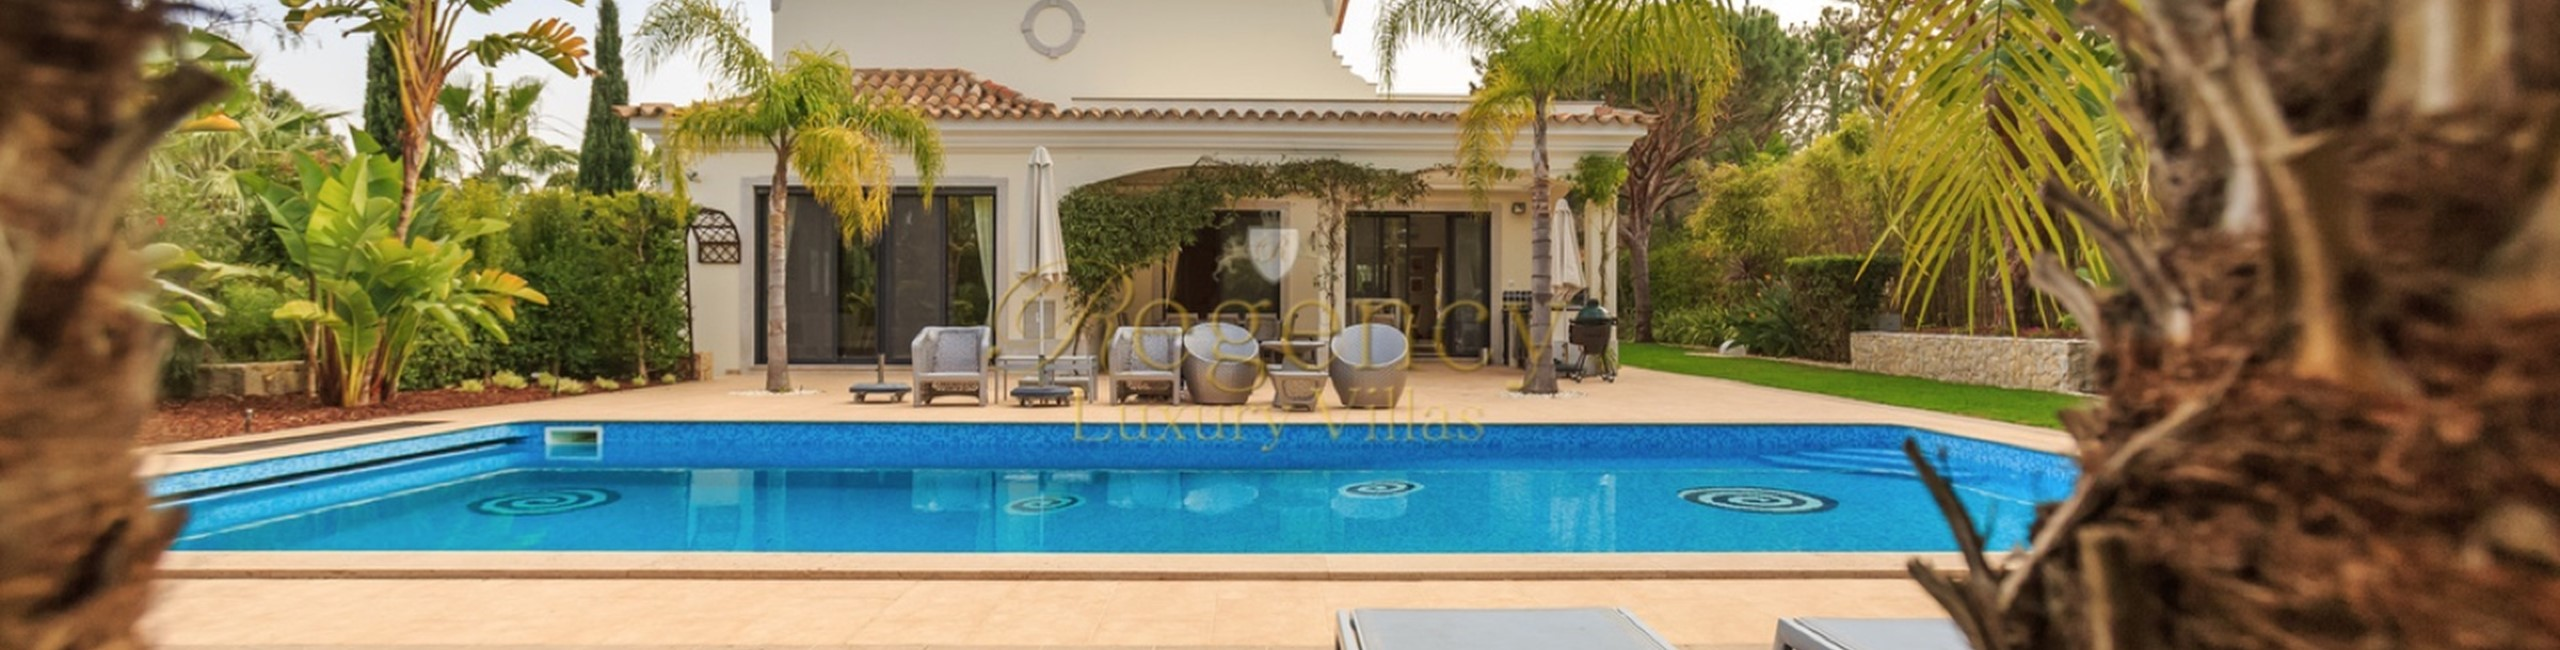 Quinta Do Lago Luxury Villa To Rent 5 Bedrooms With Pool Regency Luxury Villas